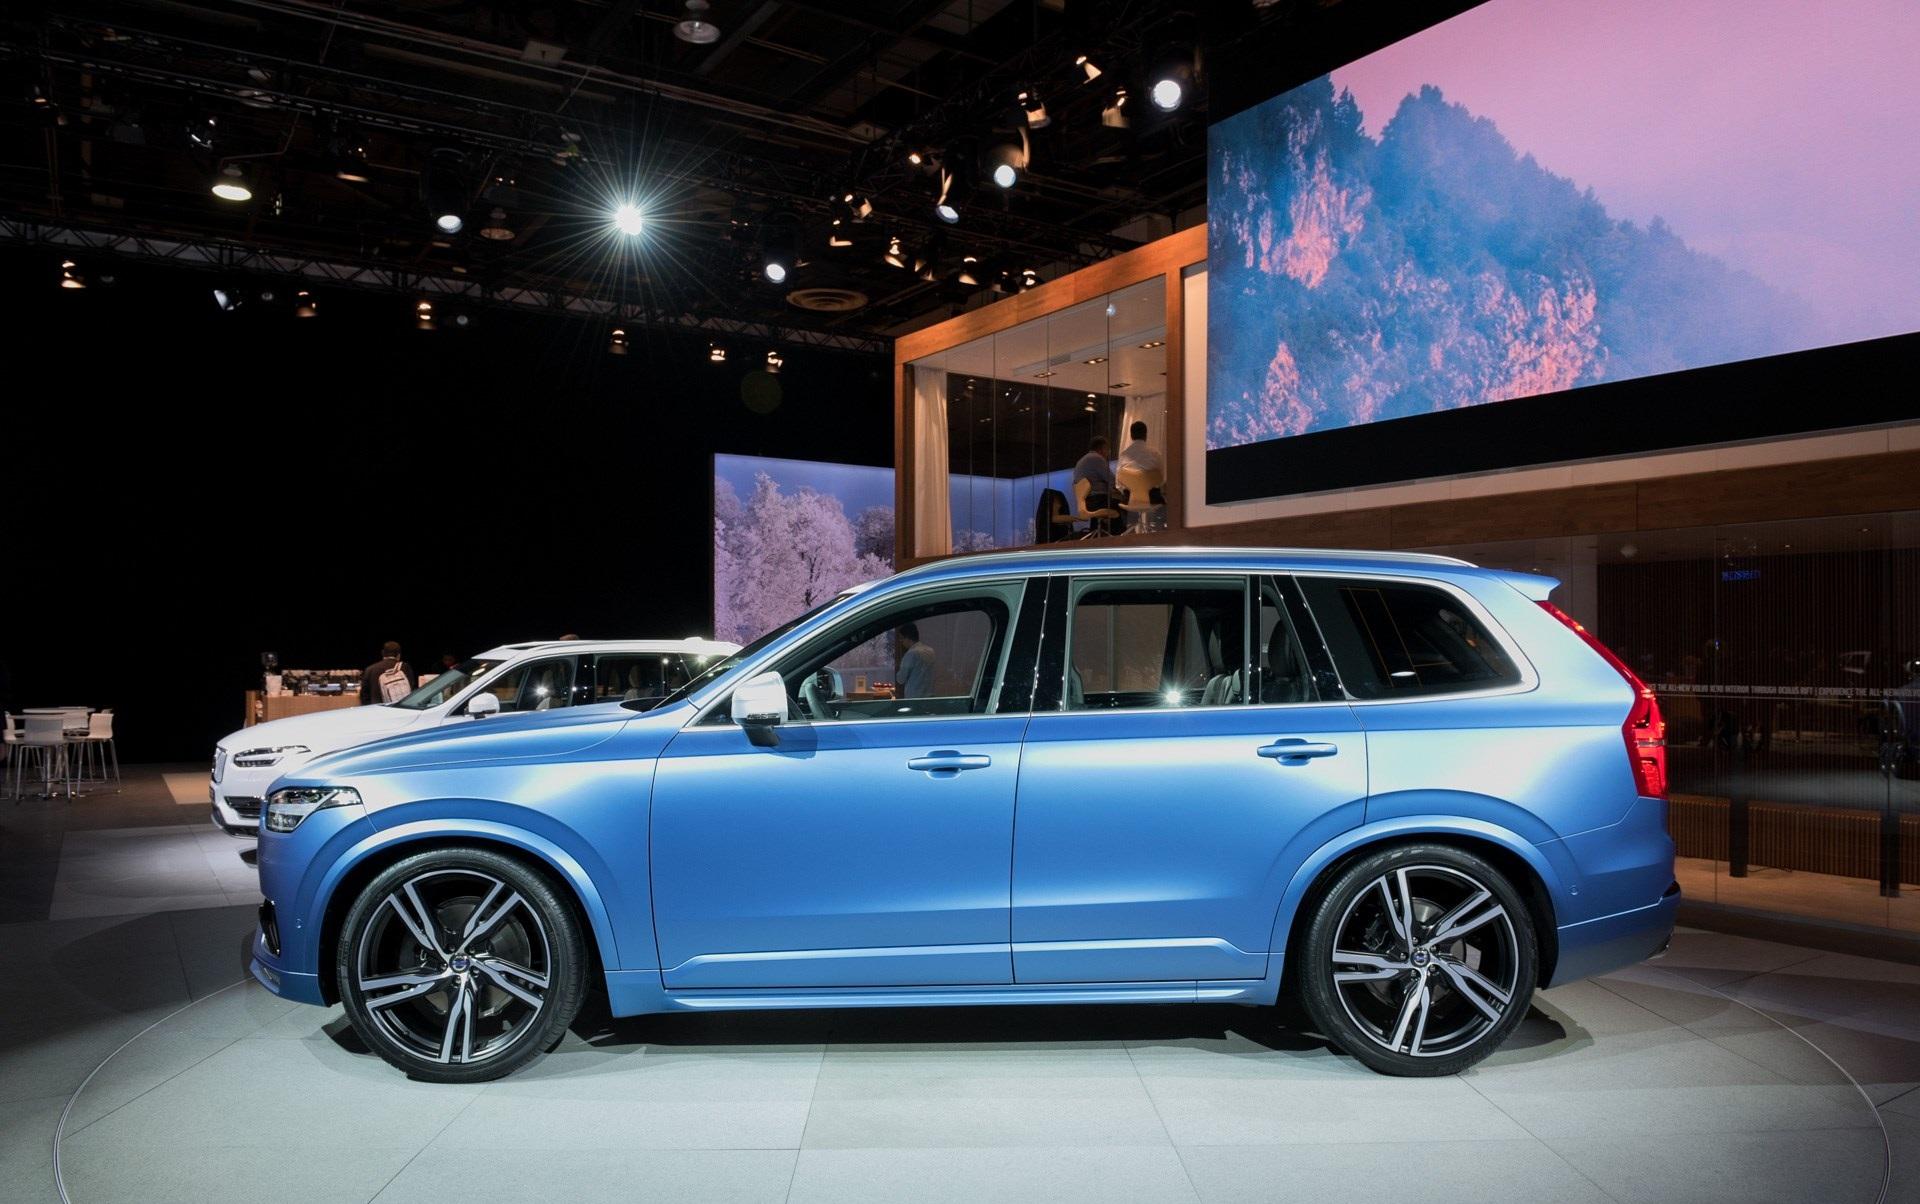 2016 Volvo Xc90 R-Design Left Side Photo